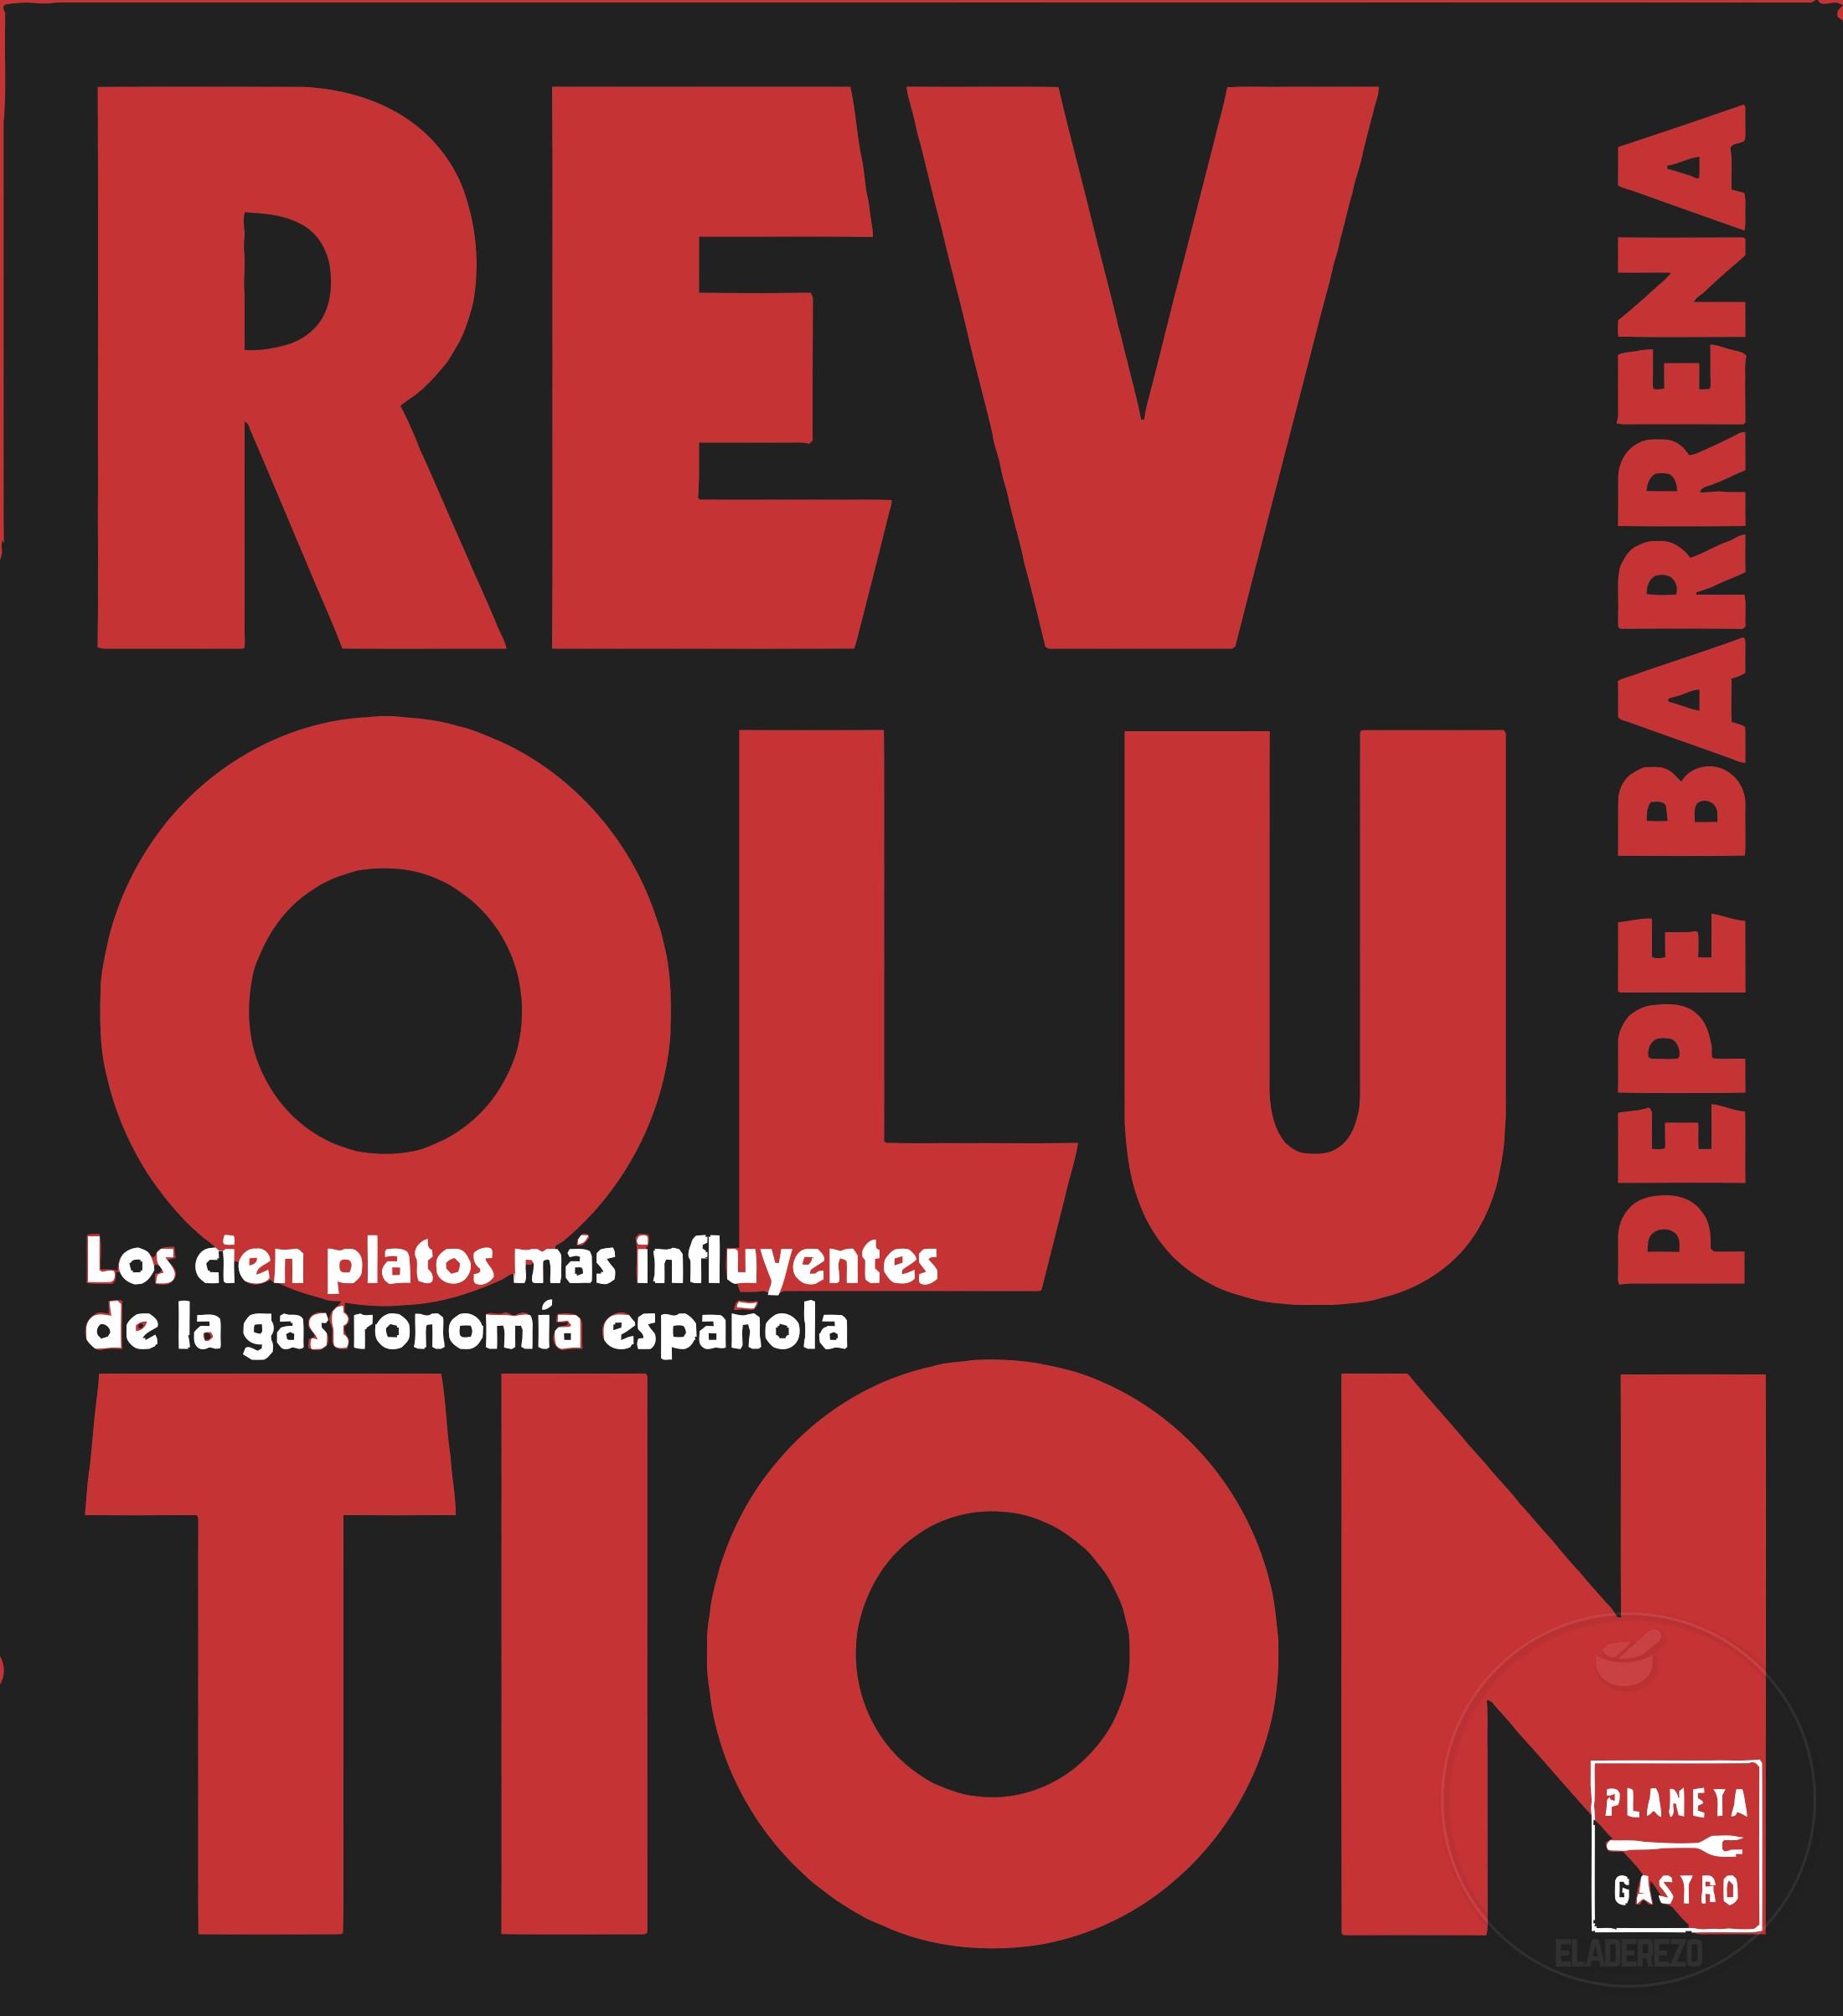 Revolution, 100 Platos inolvidables de la cocina española de vanguardia (6)